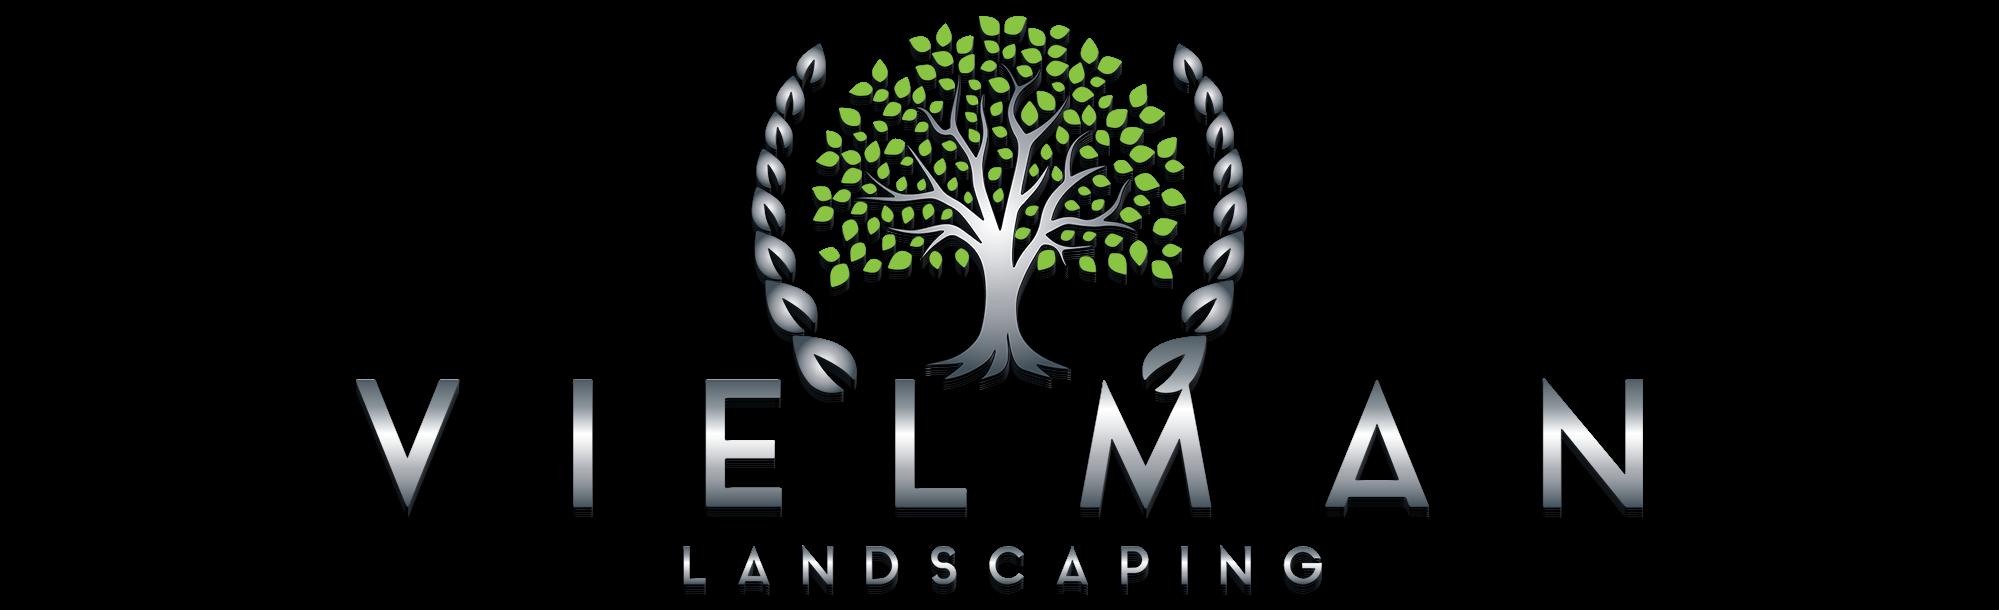 Vielman Landscaping